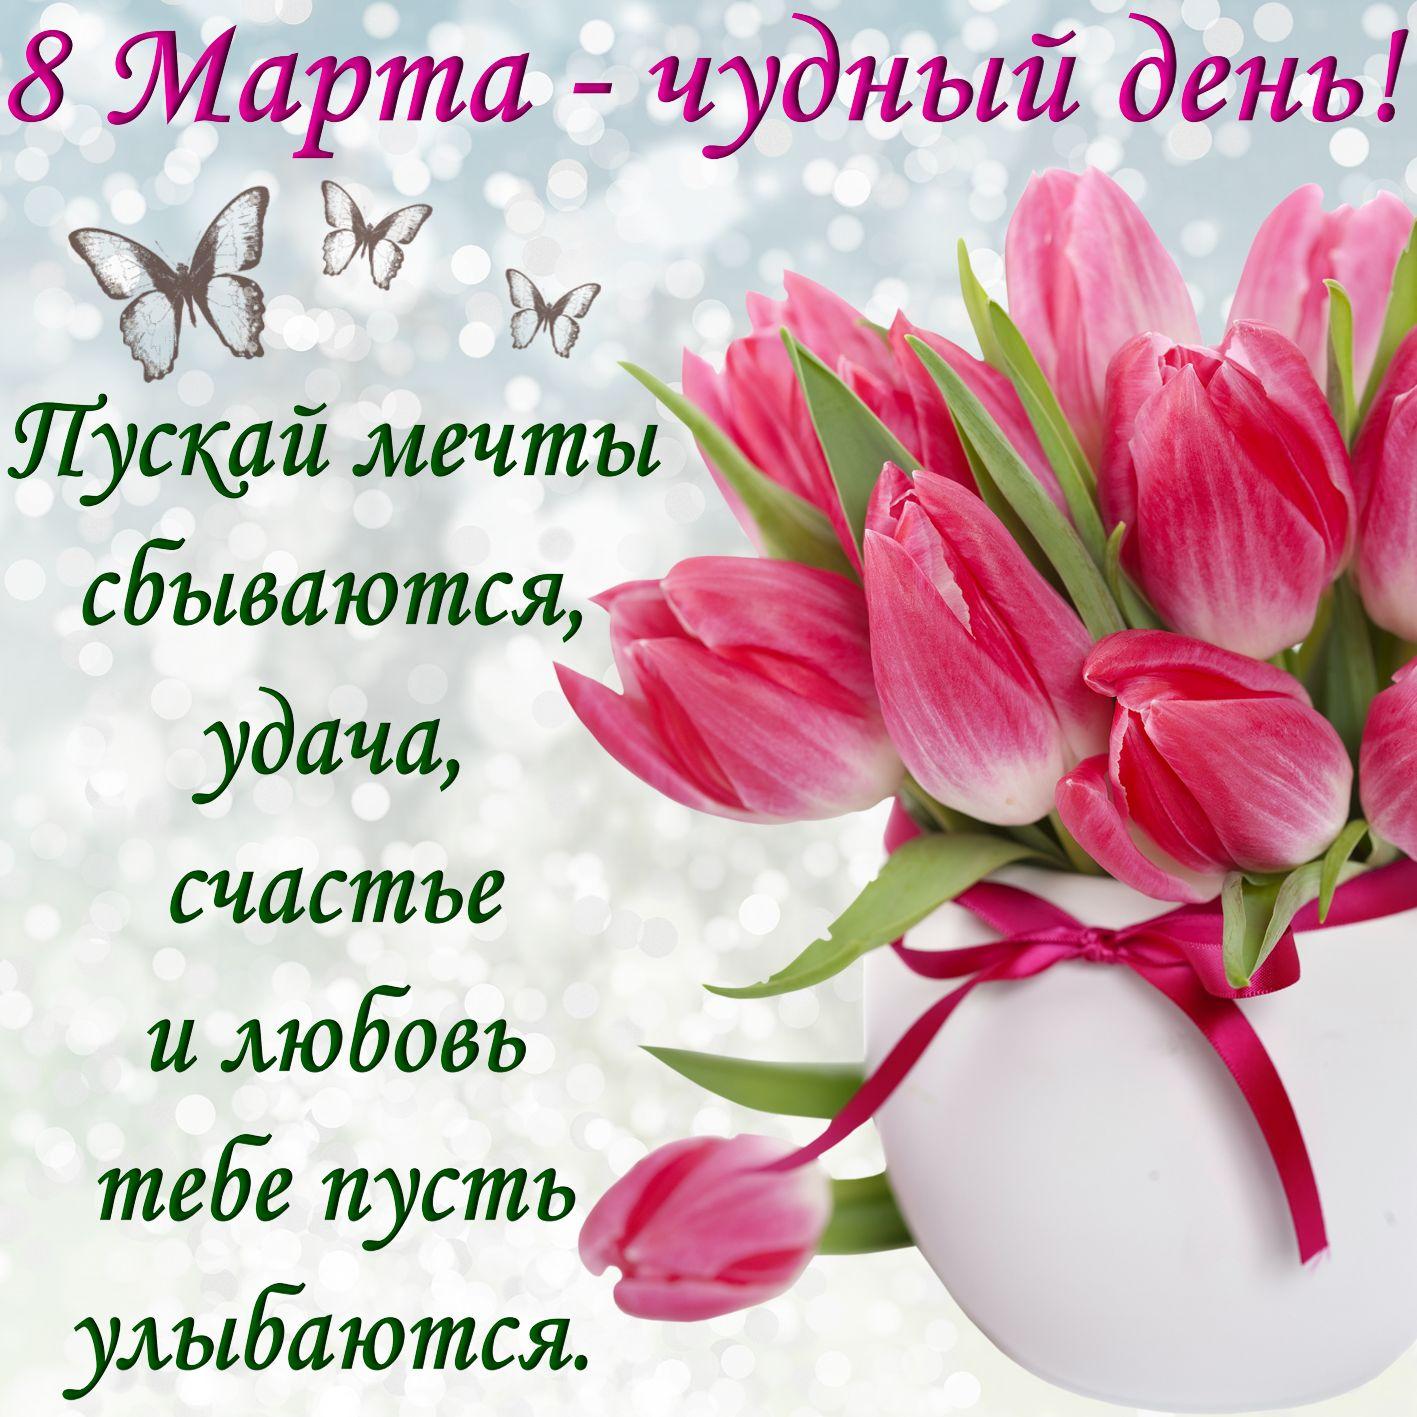 Картинки с красивыми пожеланиями на 8 марта